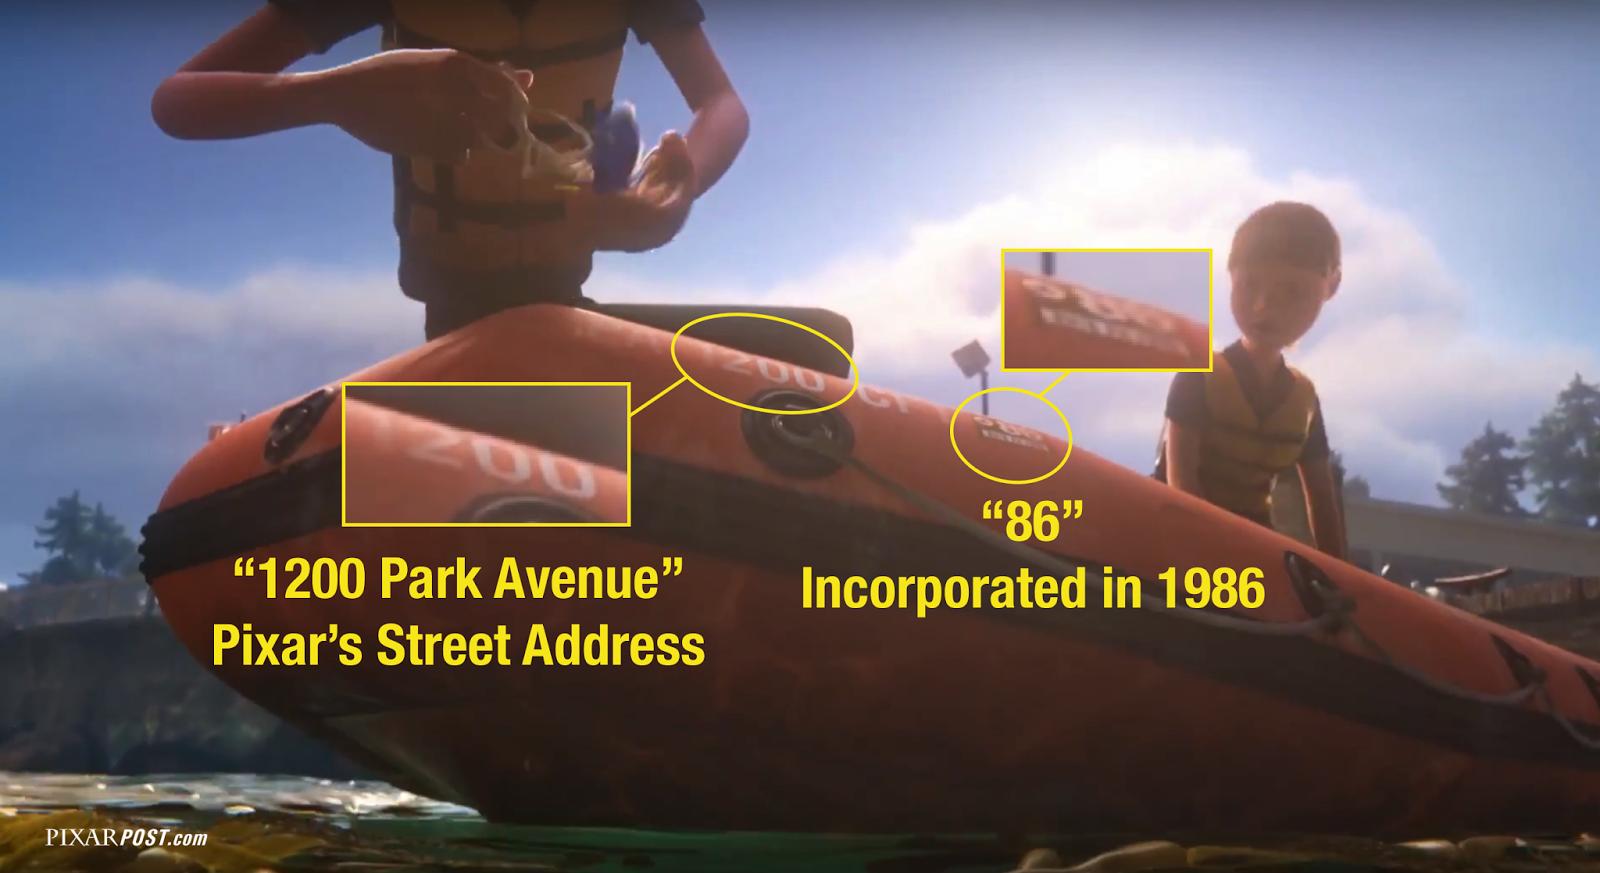 Finding Dory International Pixar Post 1 Easter Egg.png